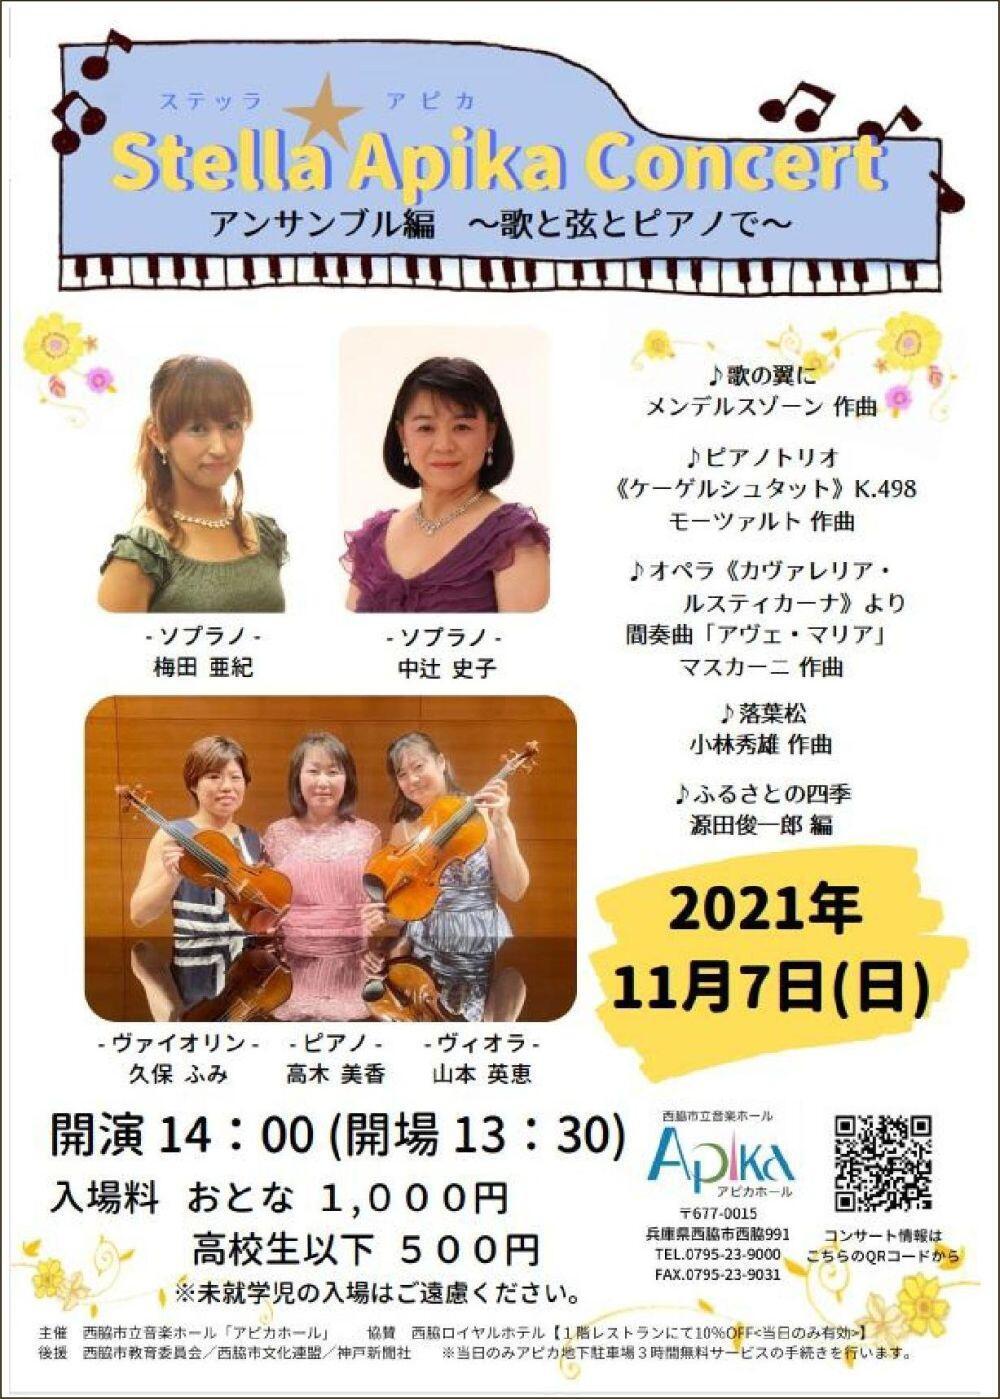 11/7 Stella Apika Concert アンサンブル編 ~歌と弦とピアノで~:アピカホール